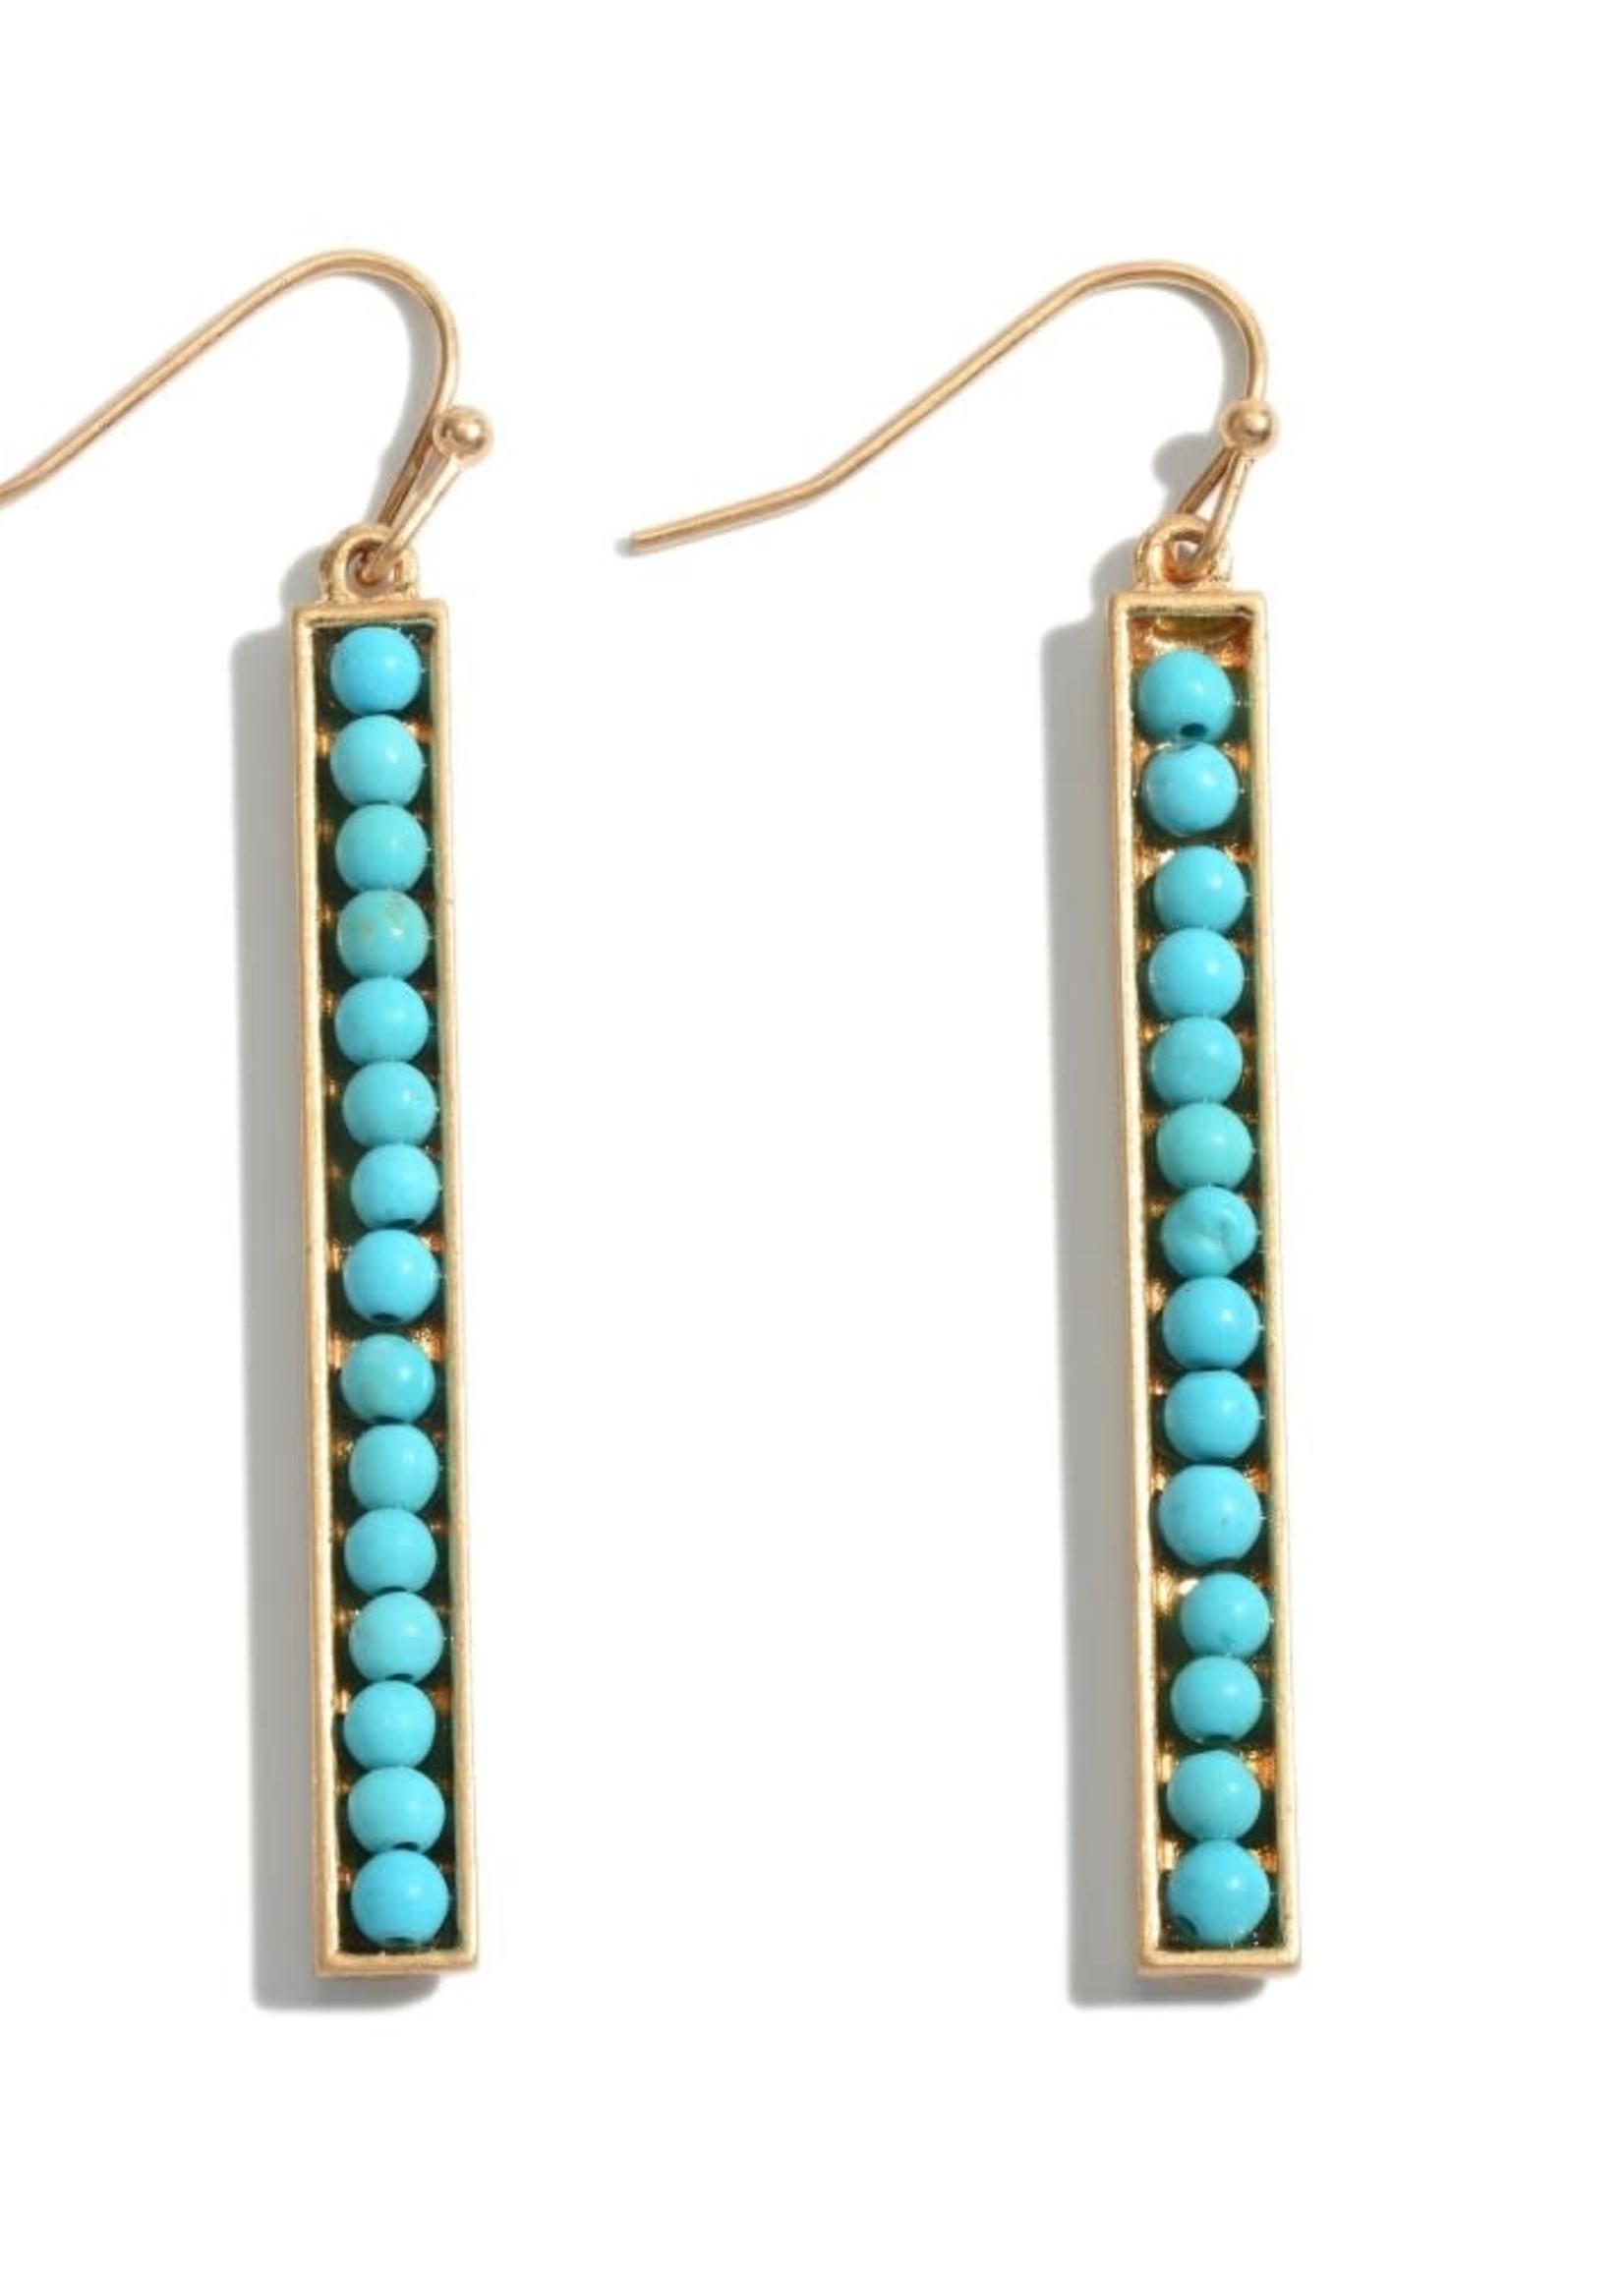 Turquoise Beaded Bar Earrings